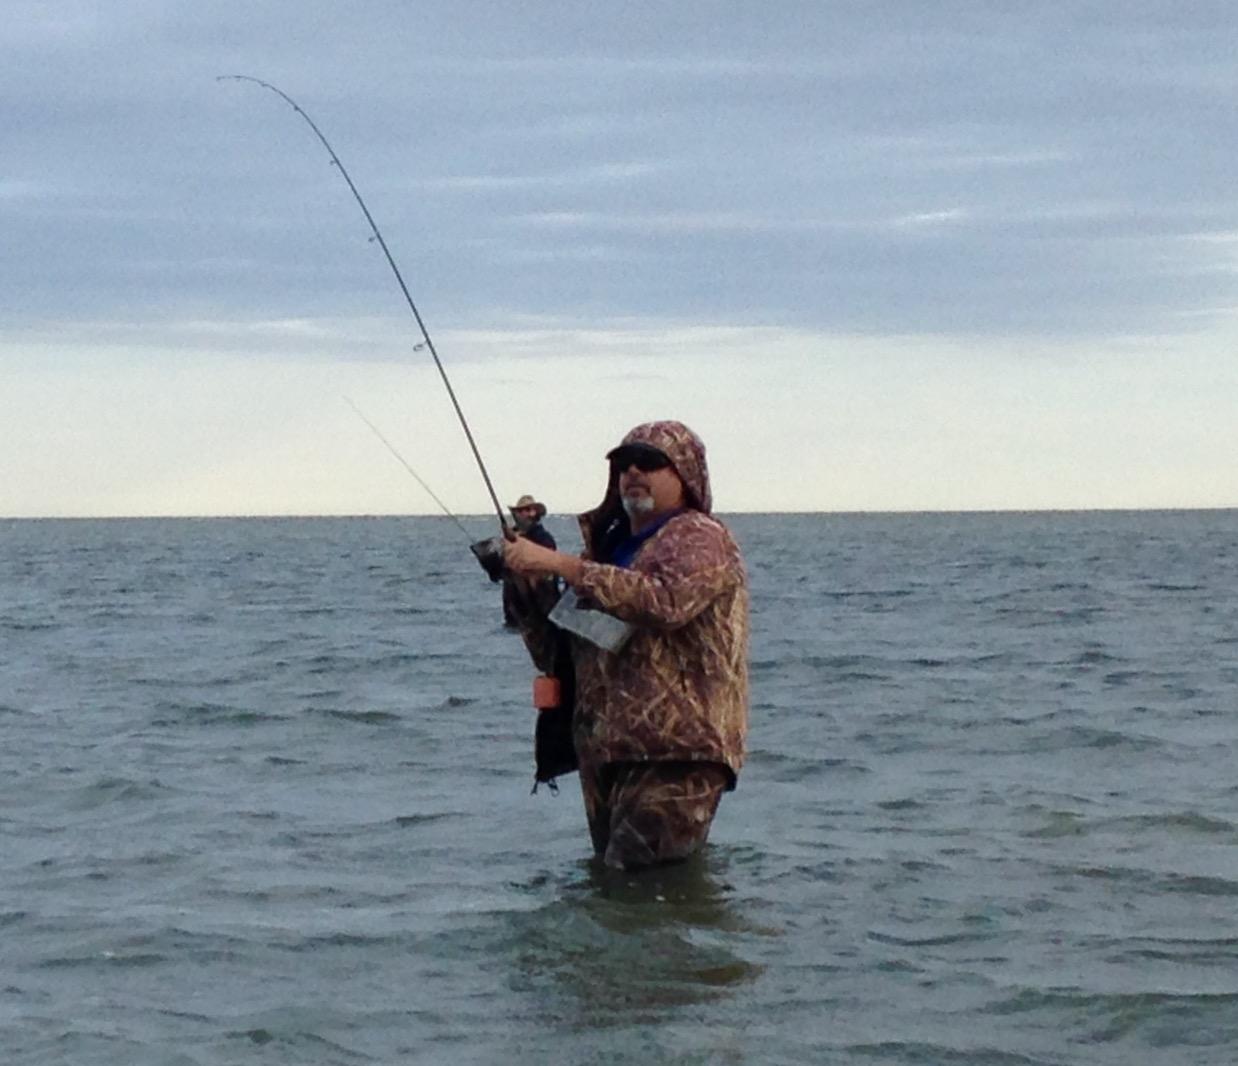 Winter wade fishing